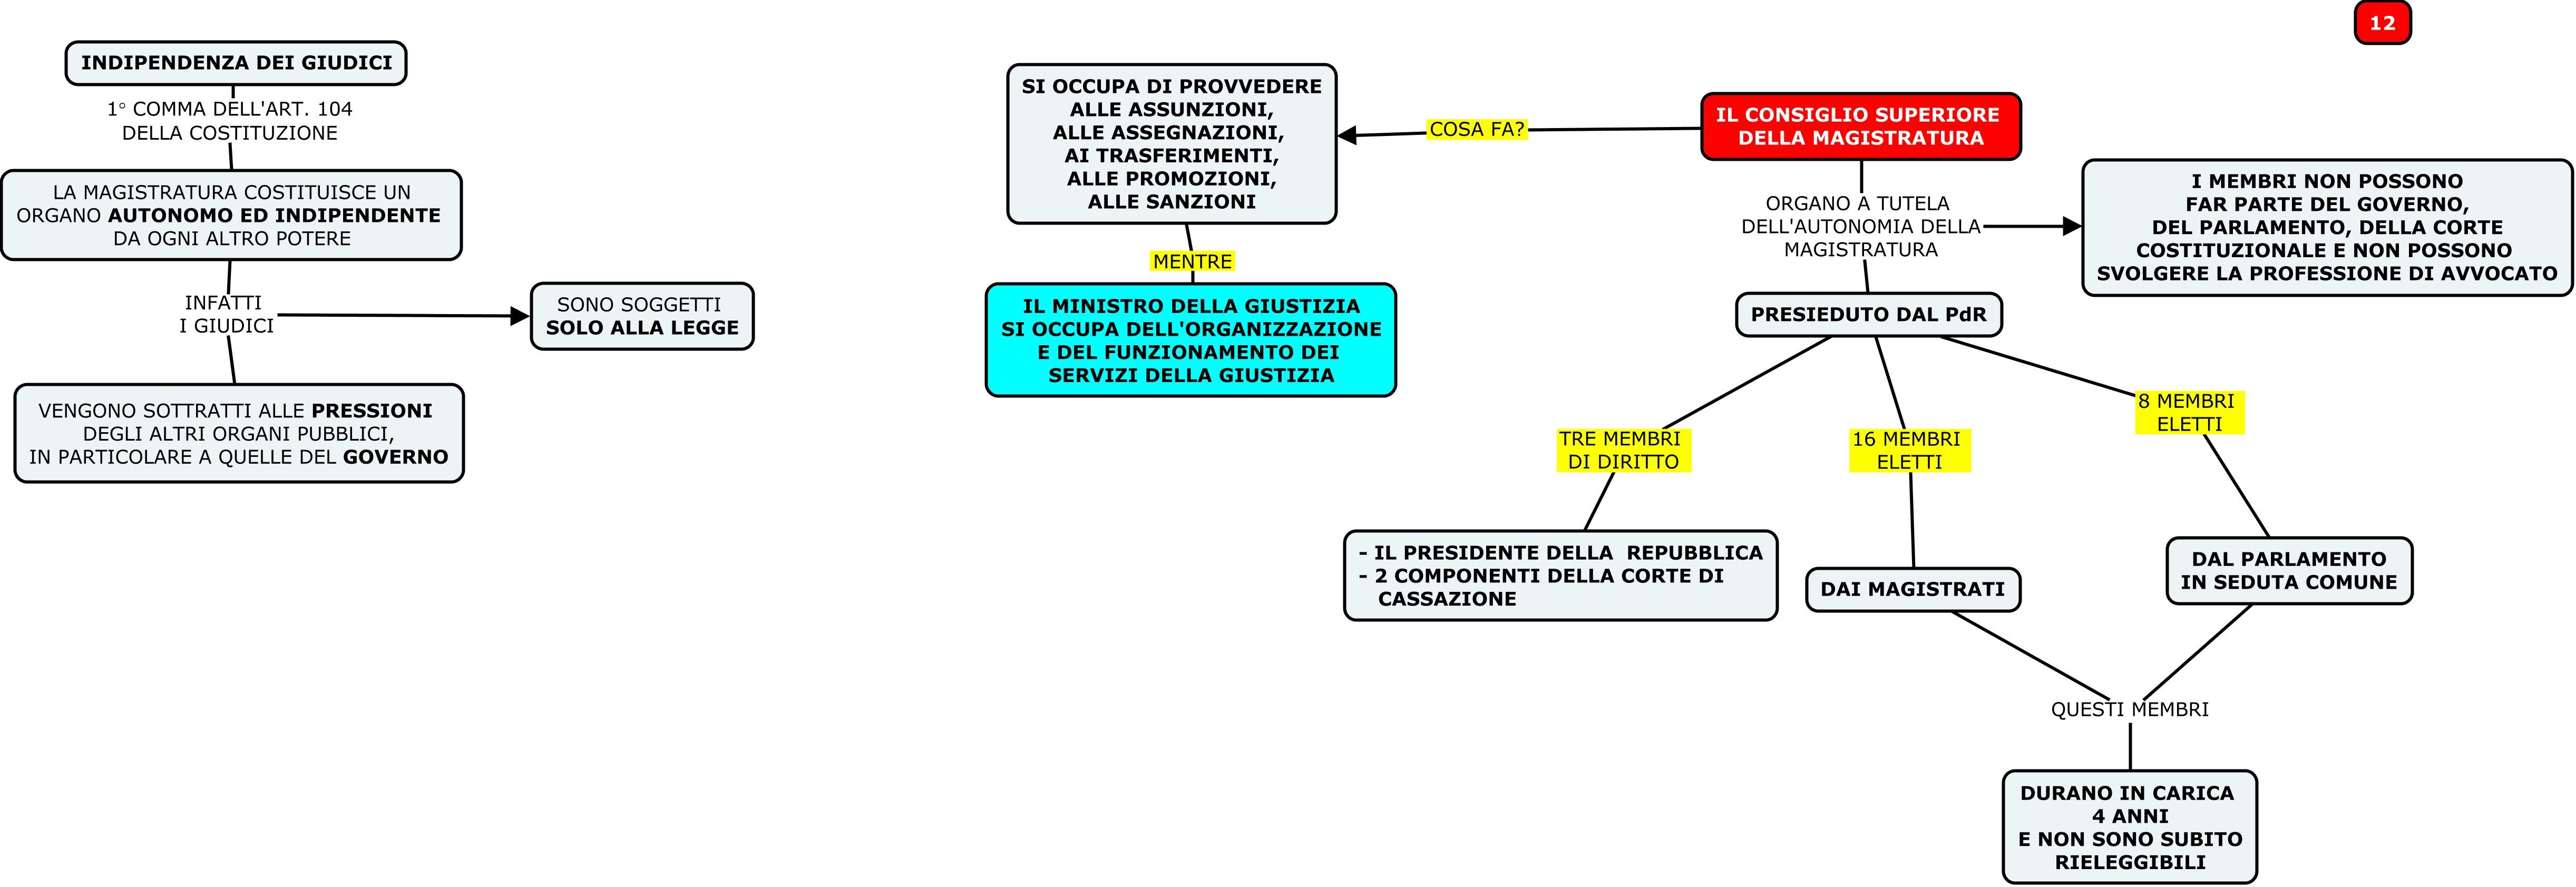 MAPPA 12